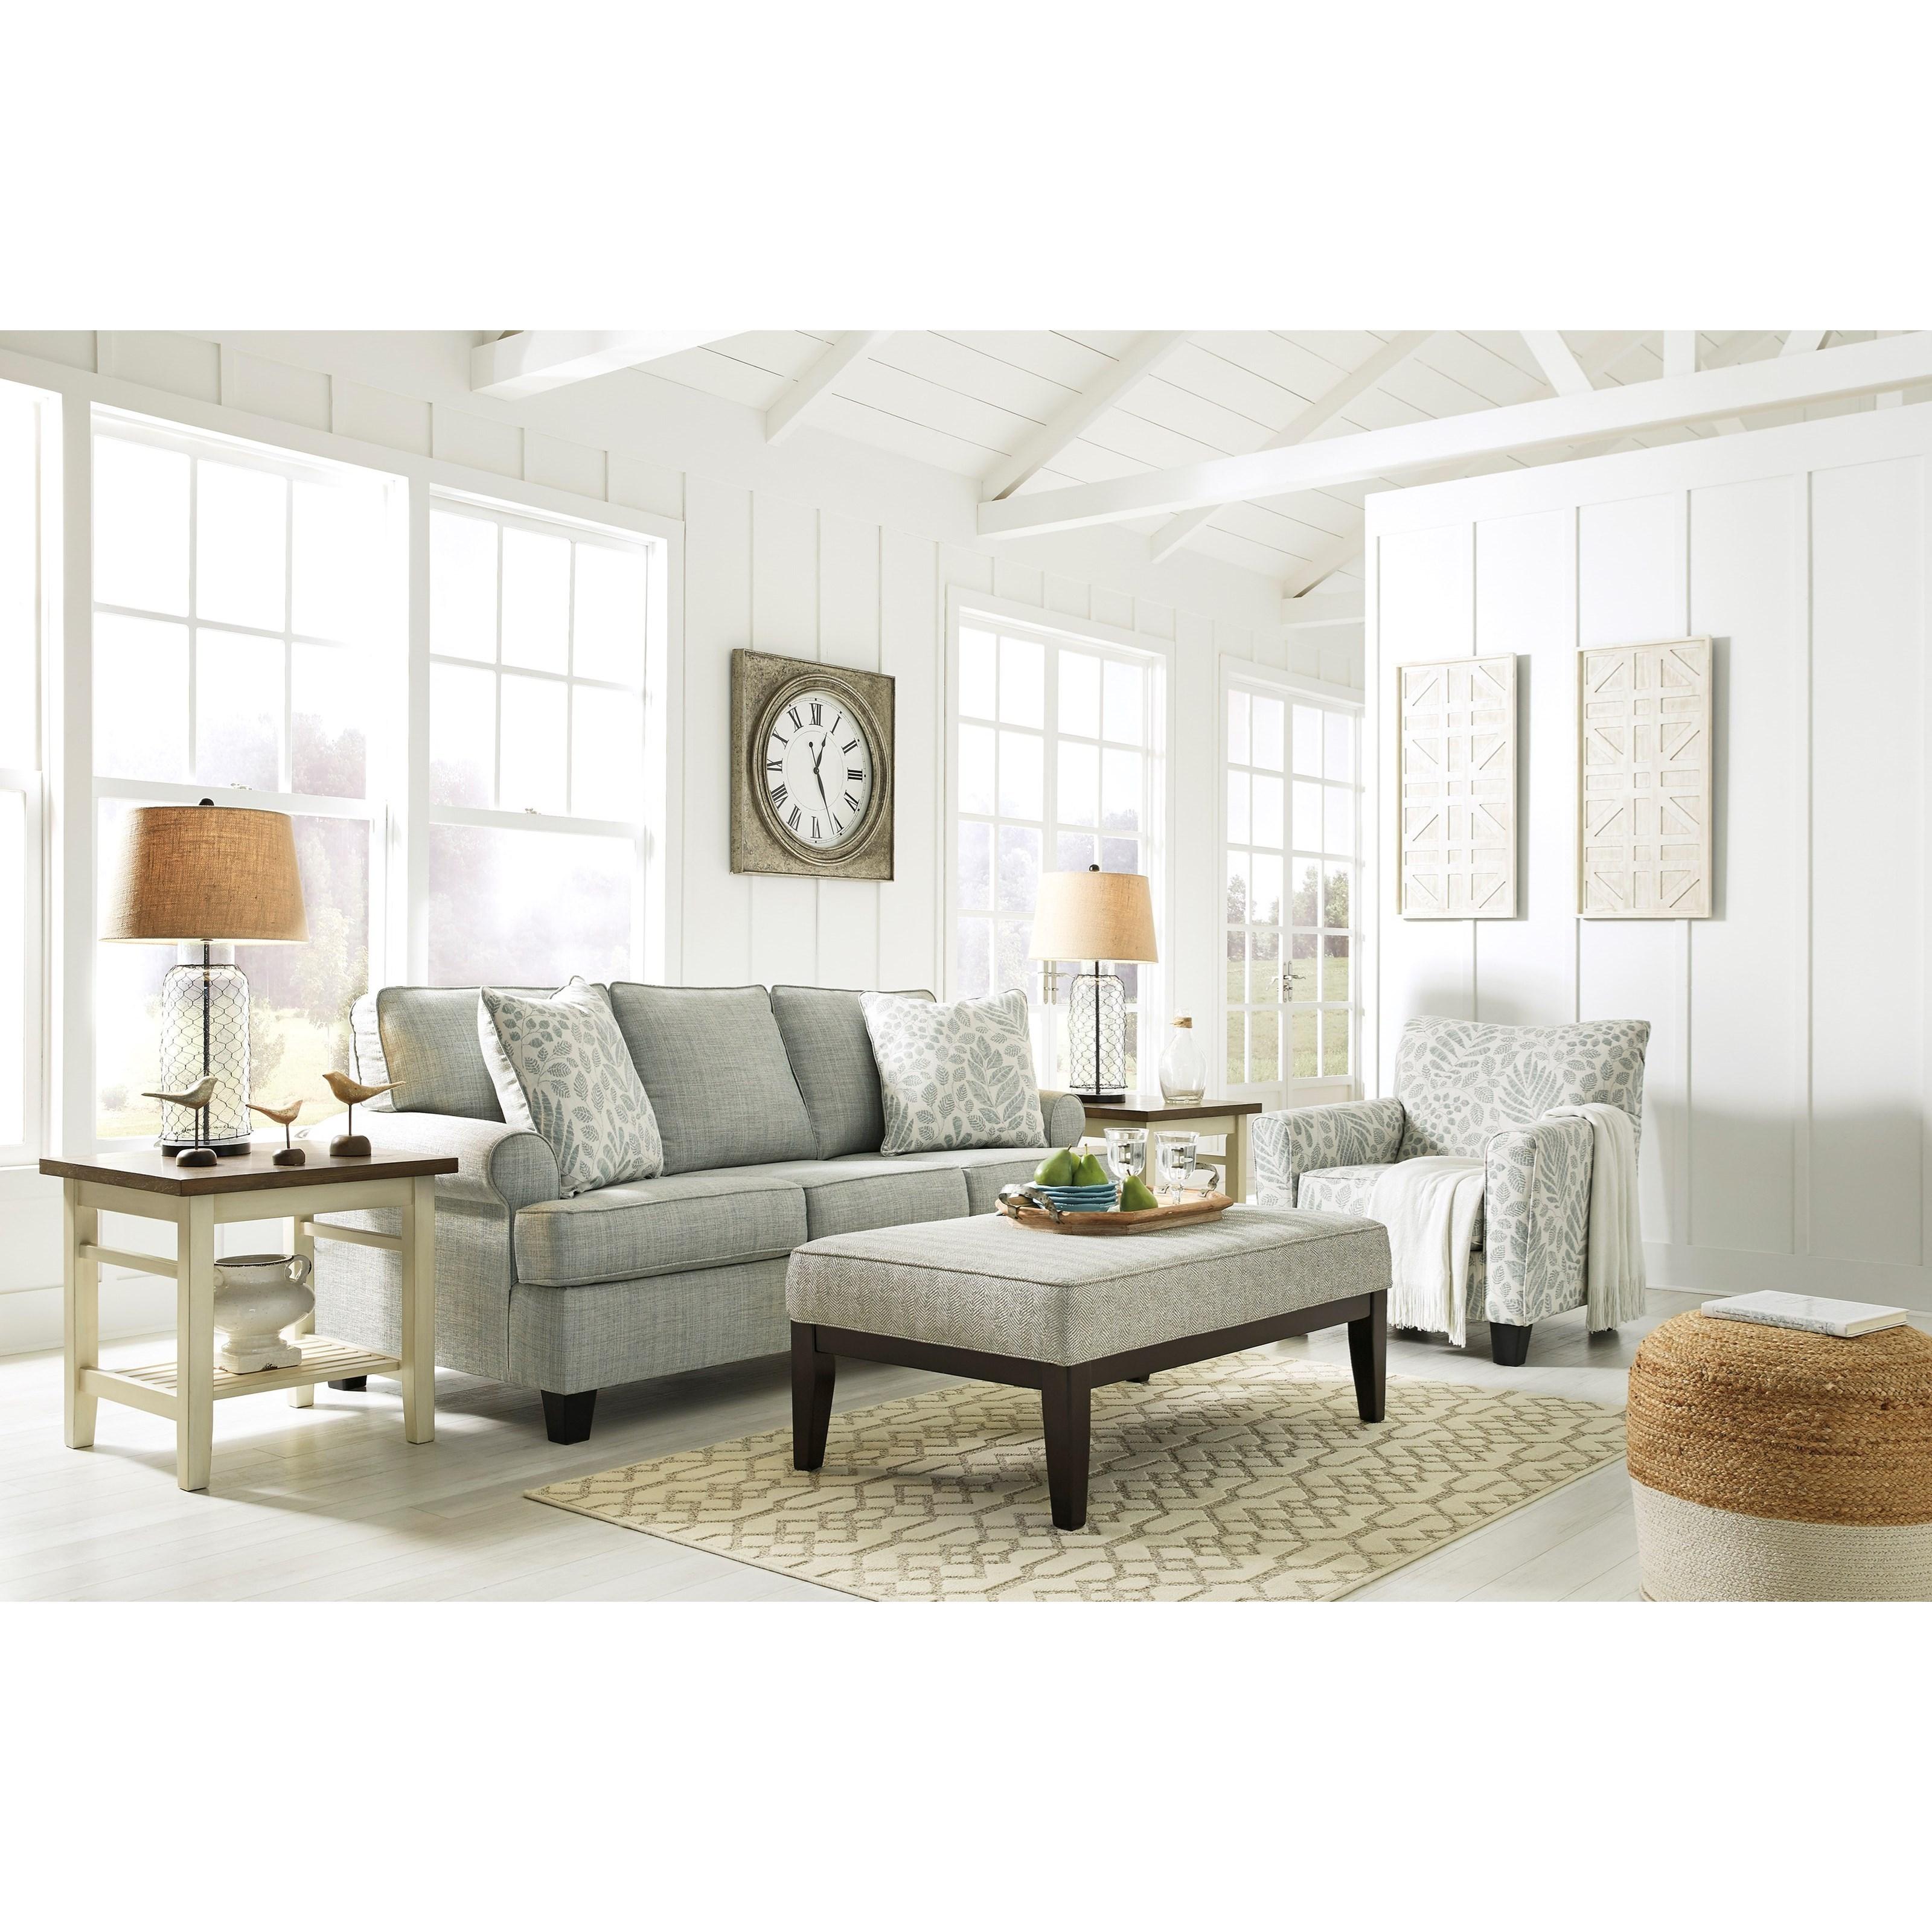 Kilarney Stationary Living Room Group by Ashley (Signature Design) at Johnny Janosik